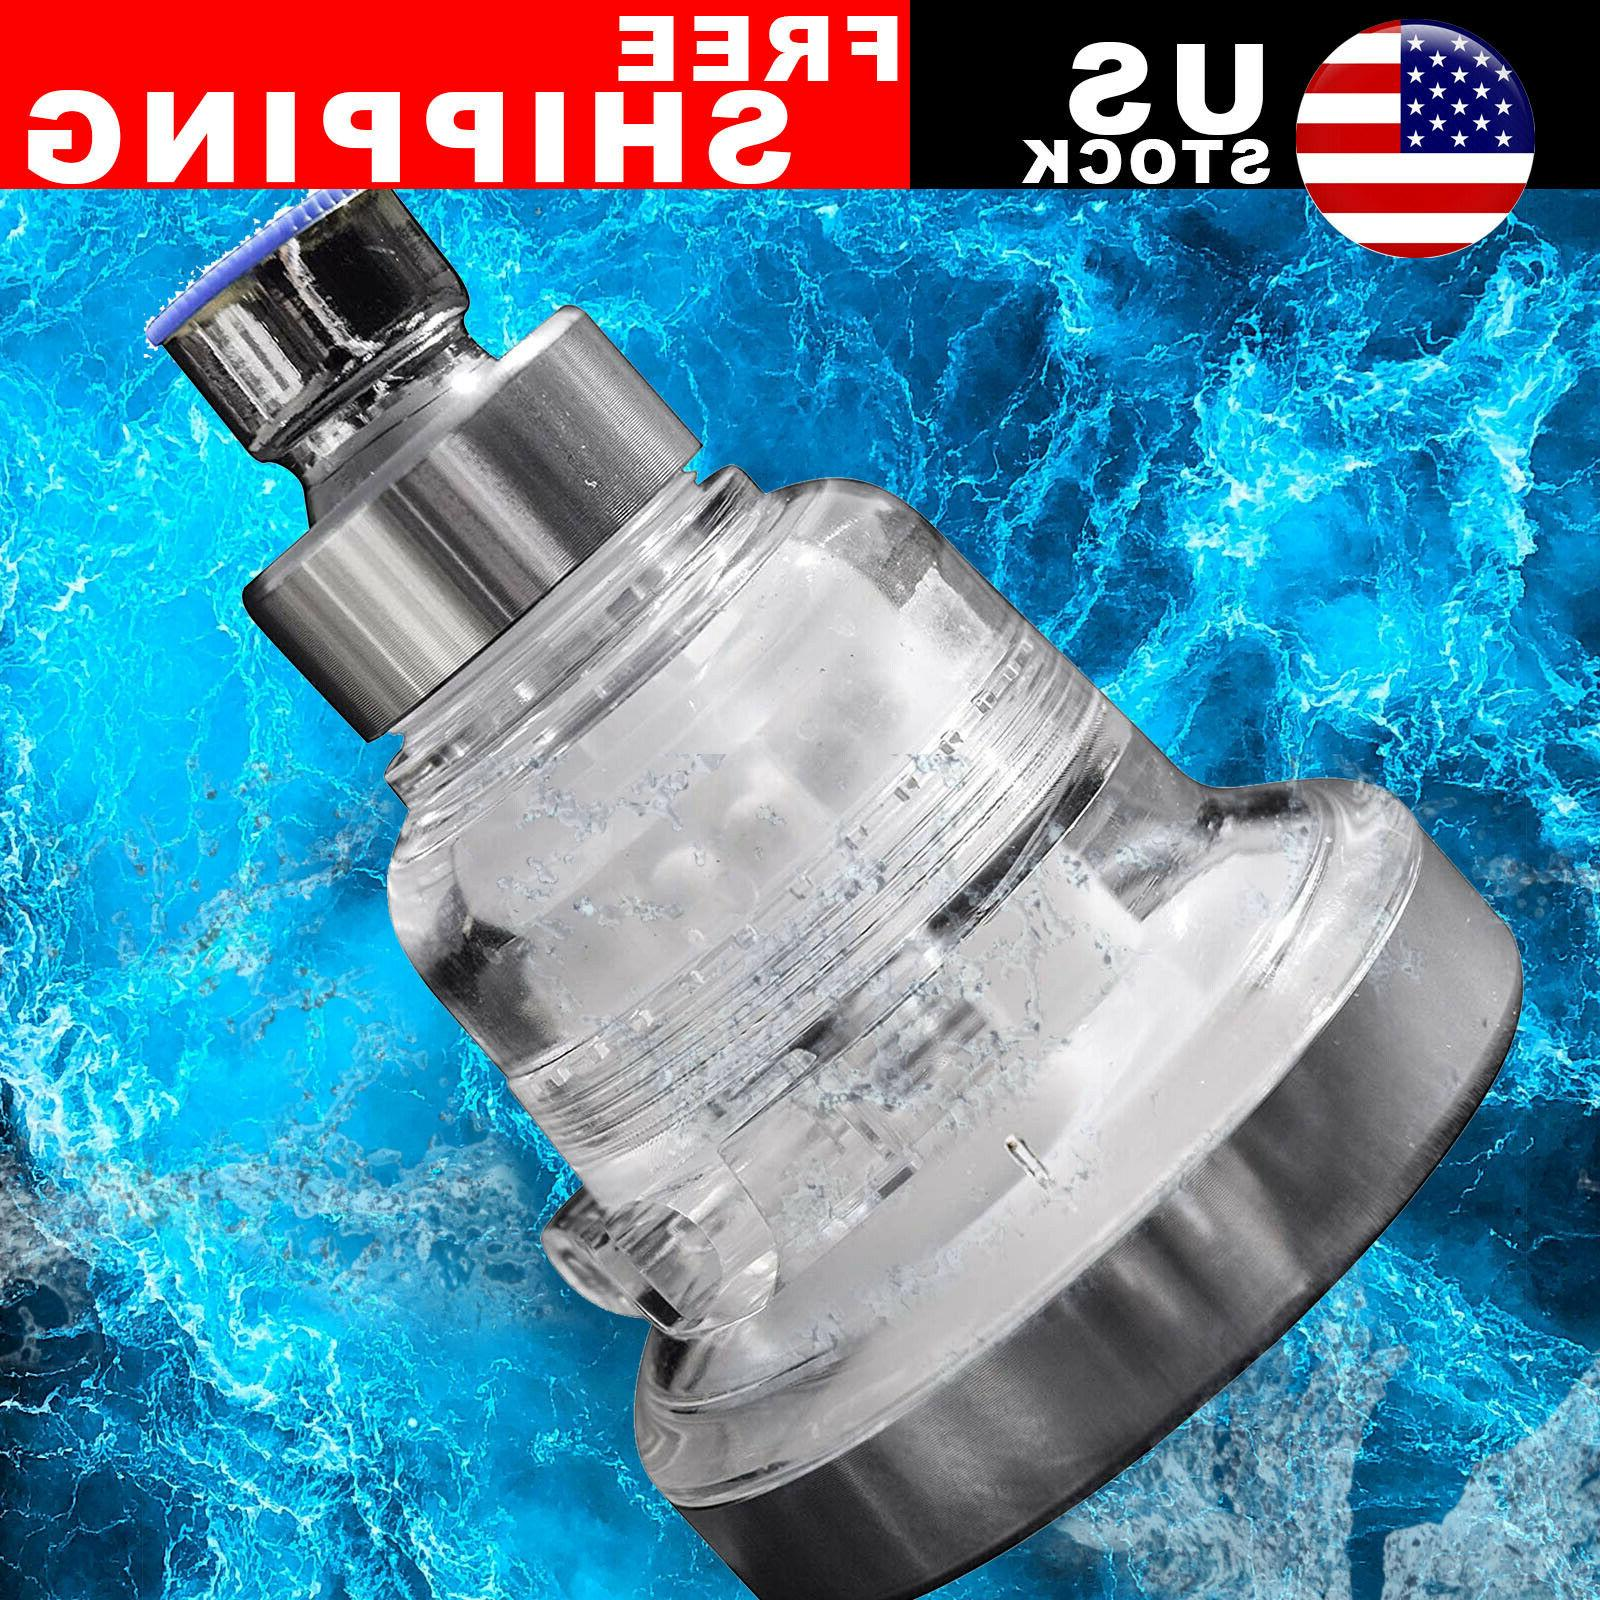 3 High Shower Head Water Softener Water